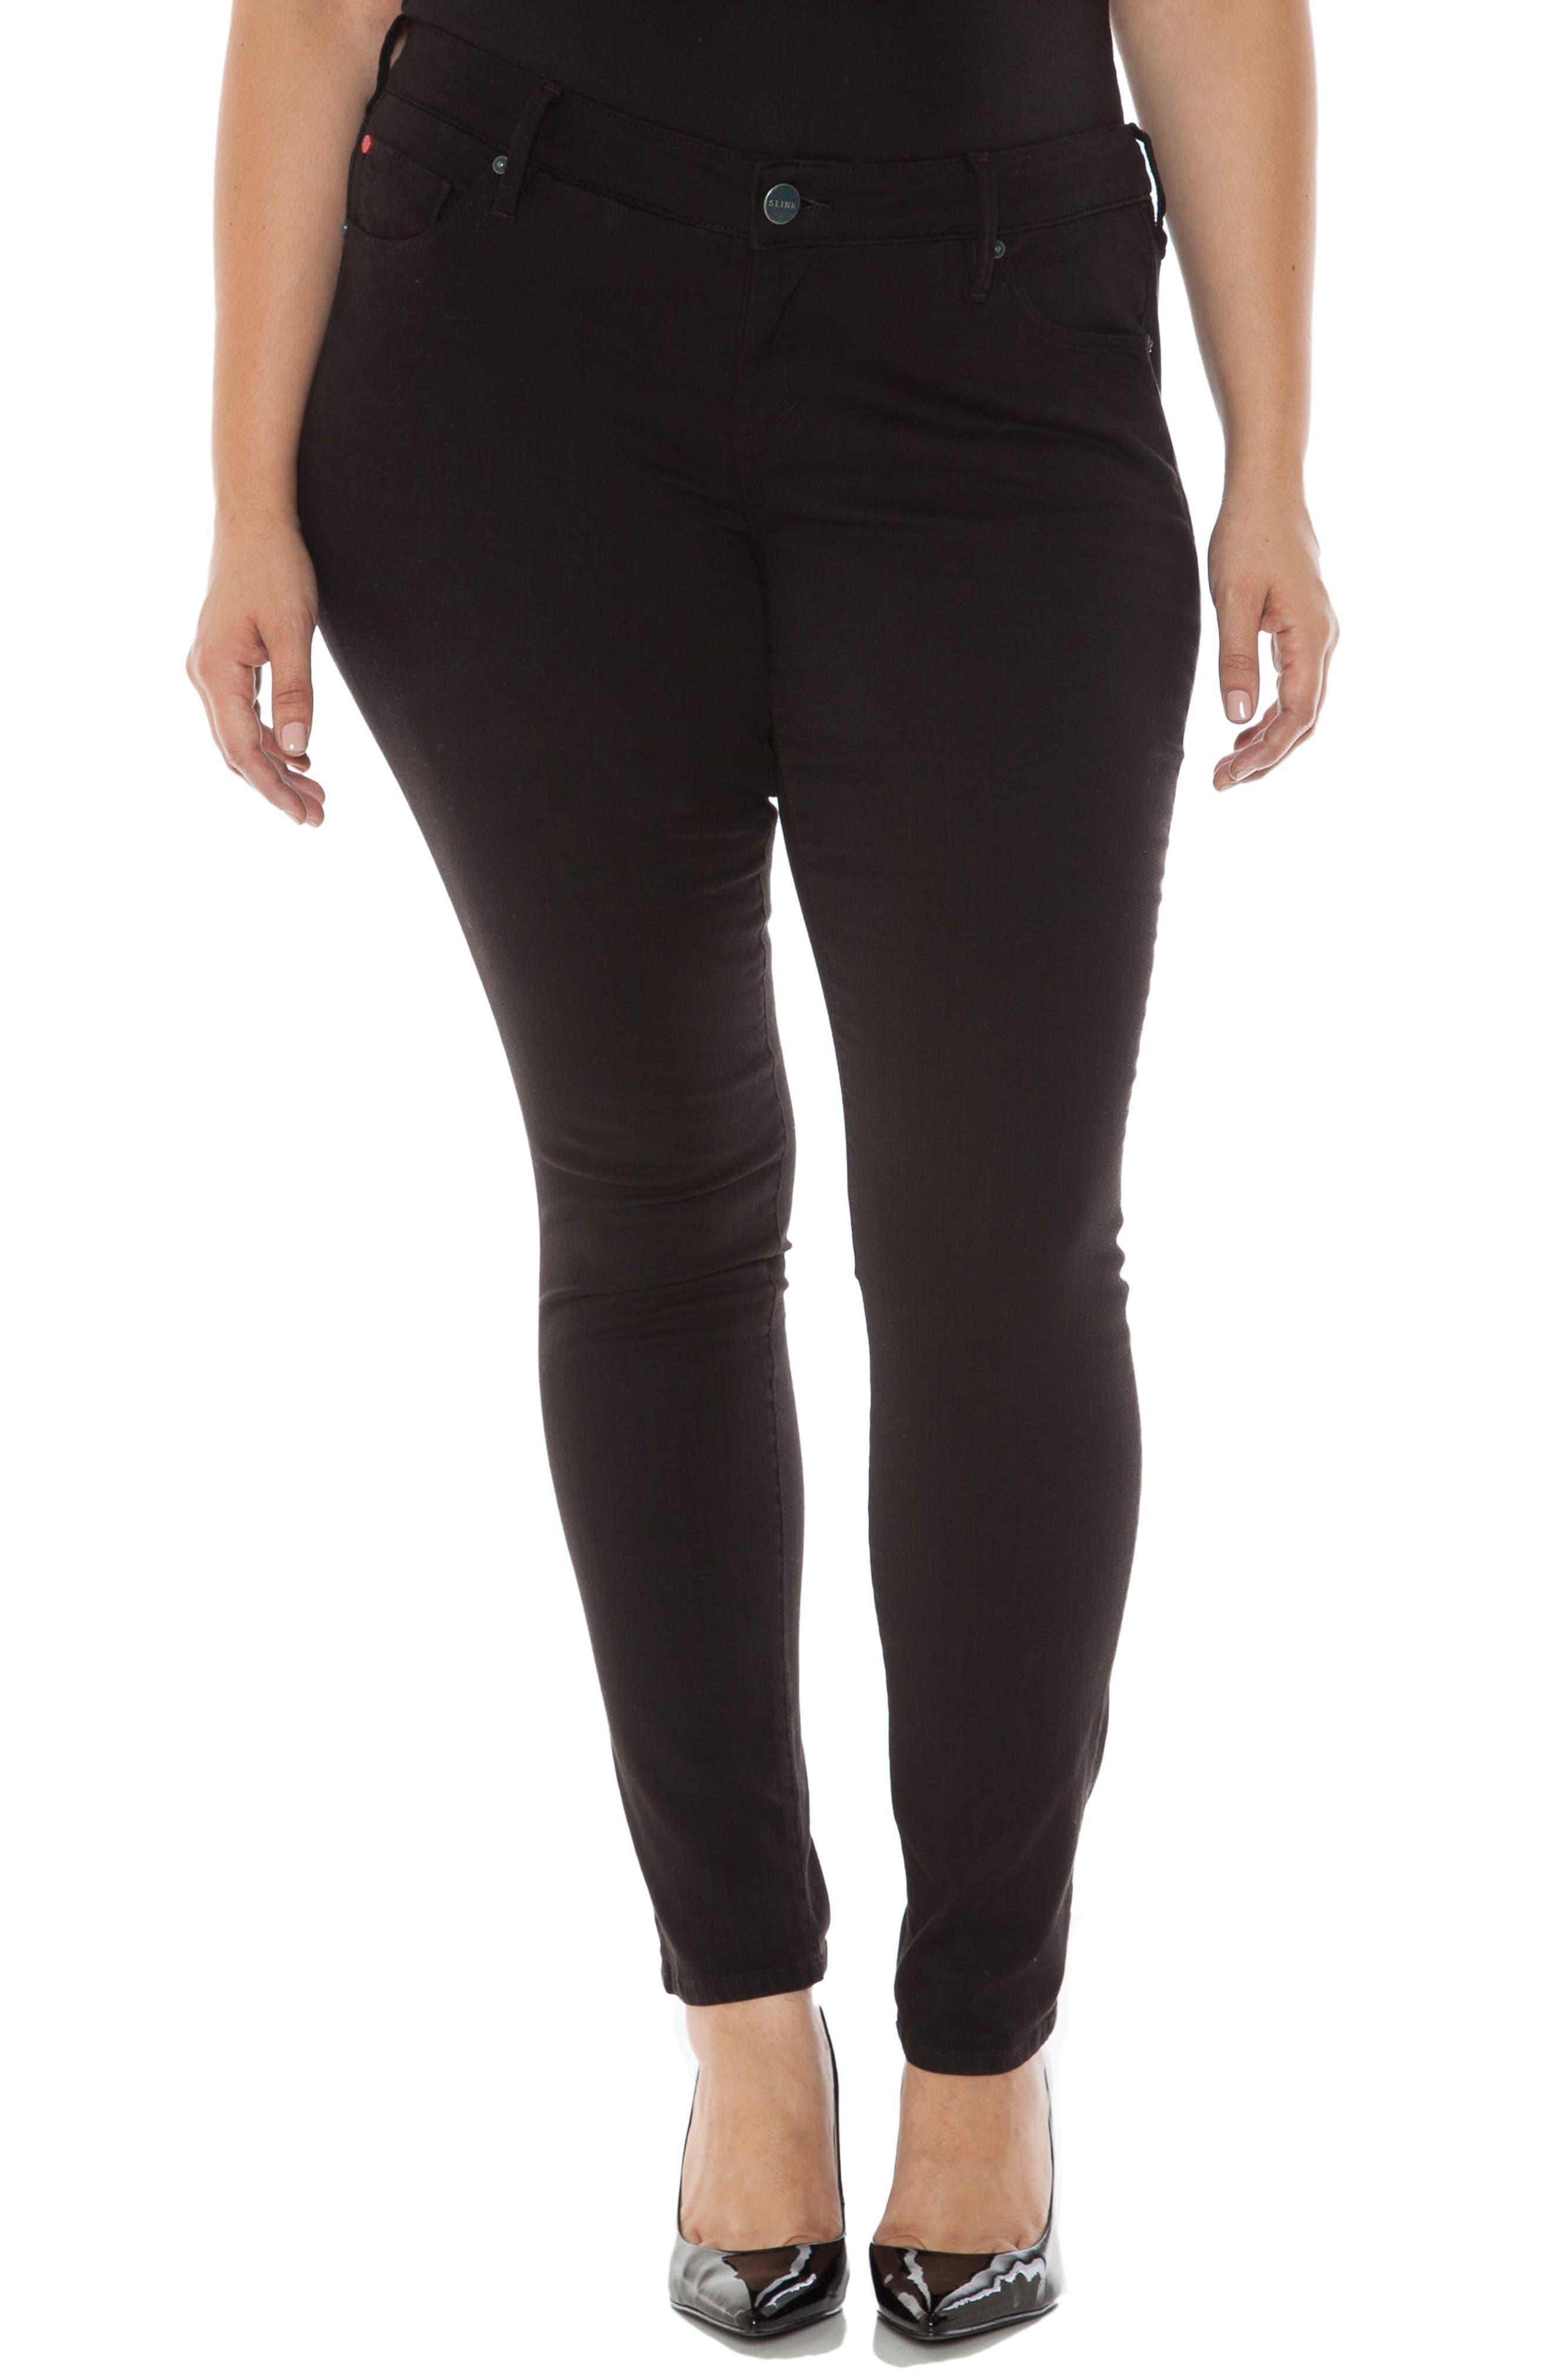 Main Image - SLINK Jeans 'The Skinny' Stretch Denim Jeans (Danielle) (Plus Size)